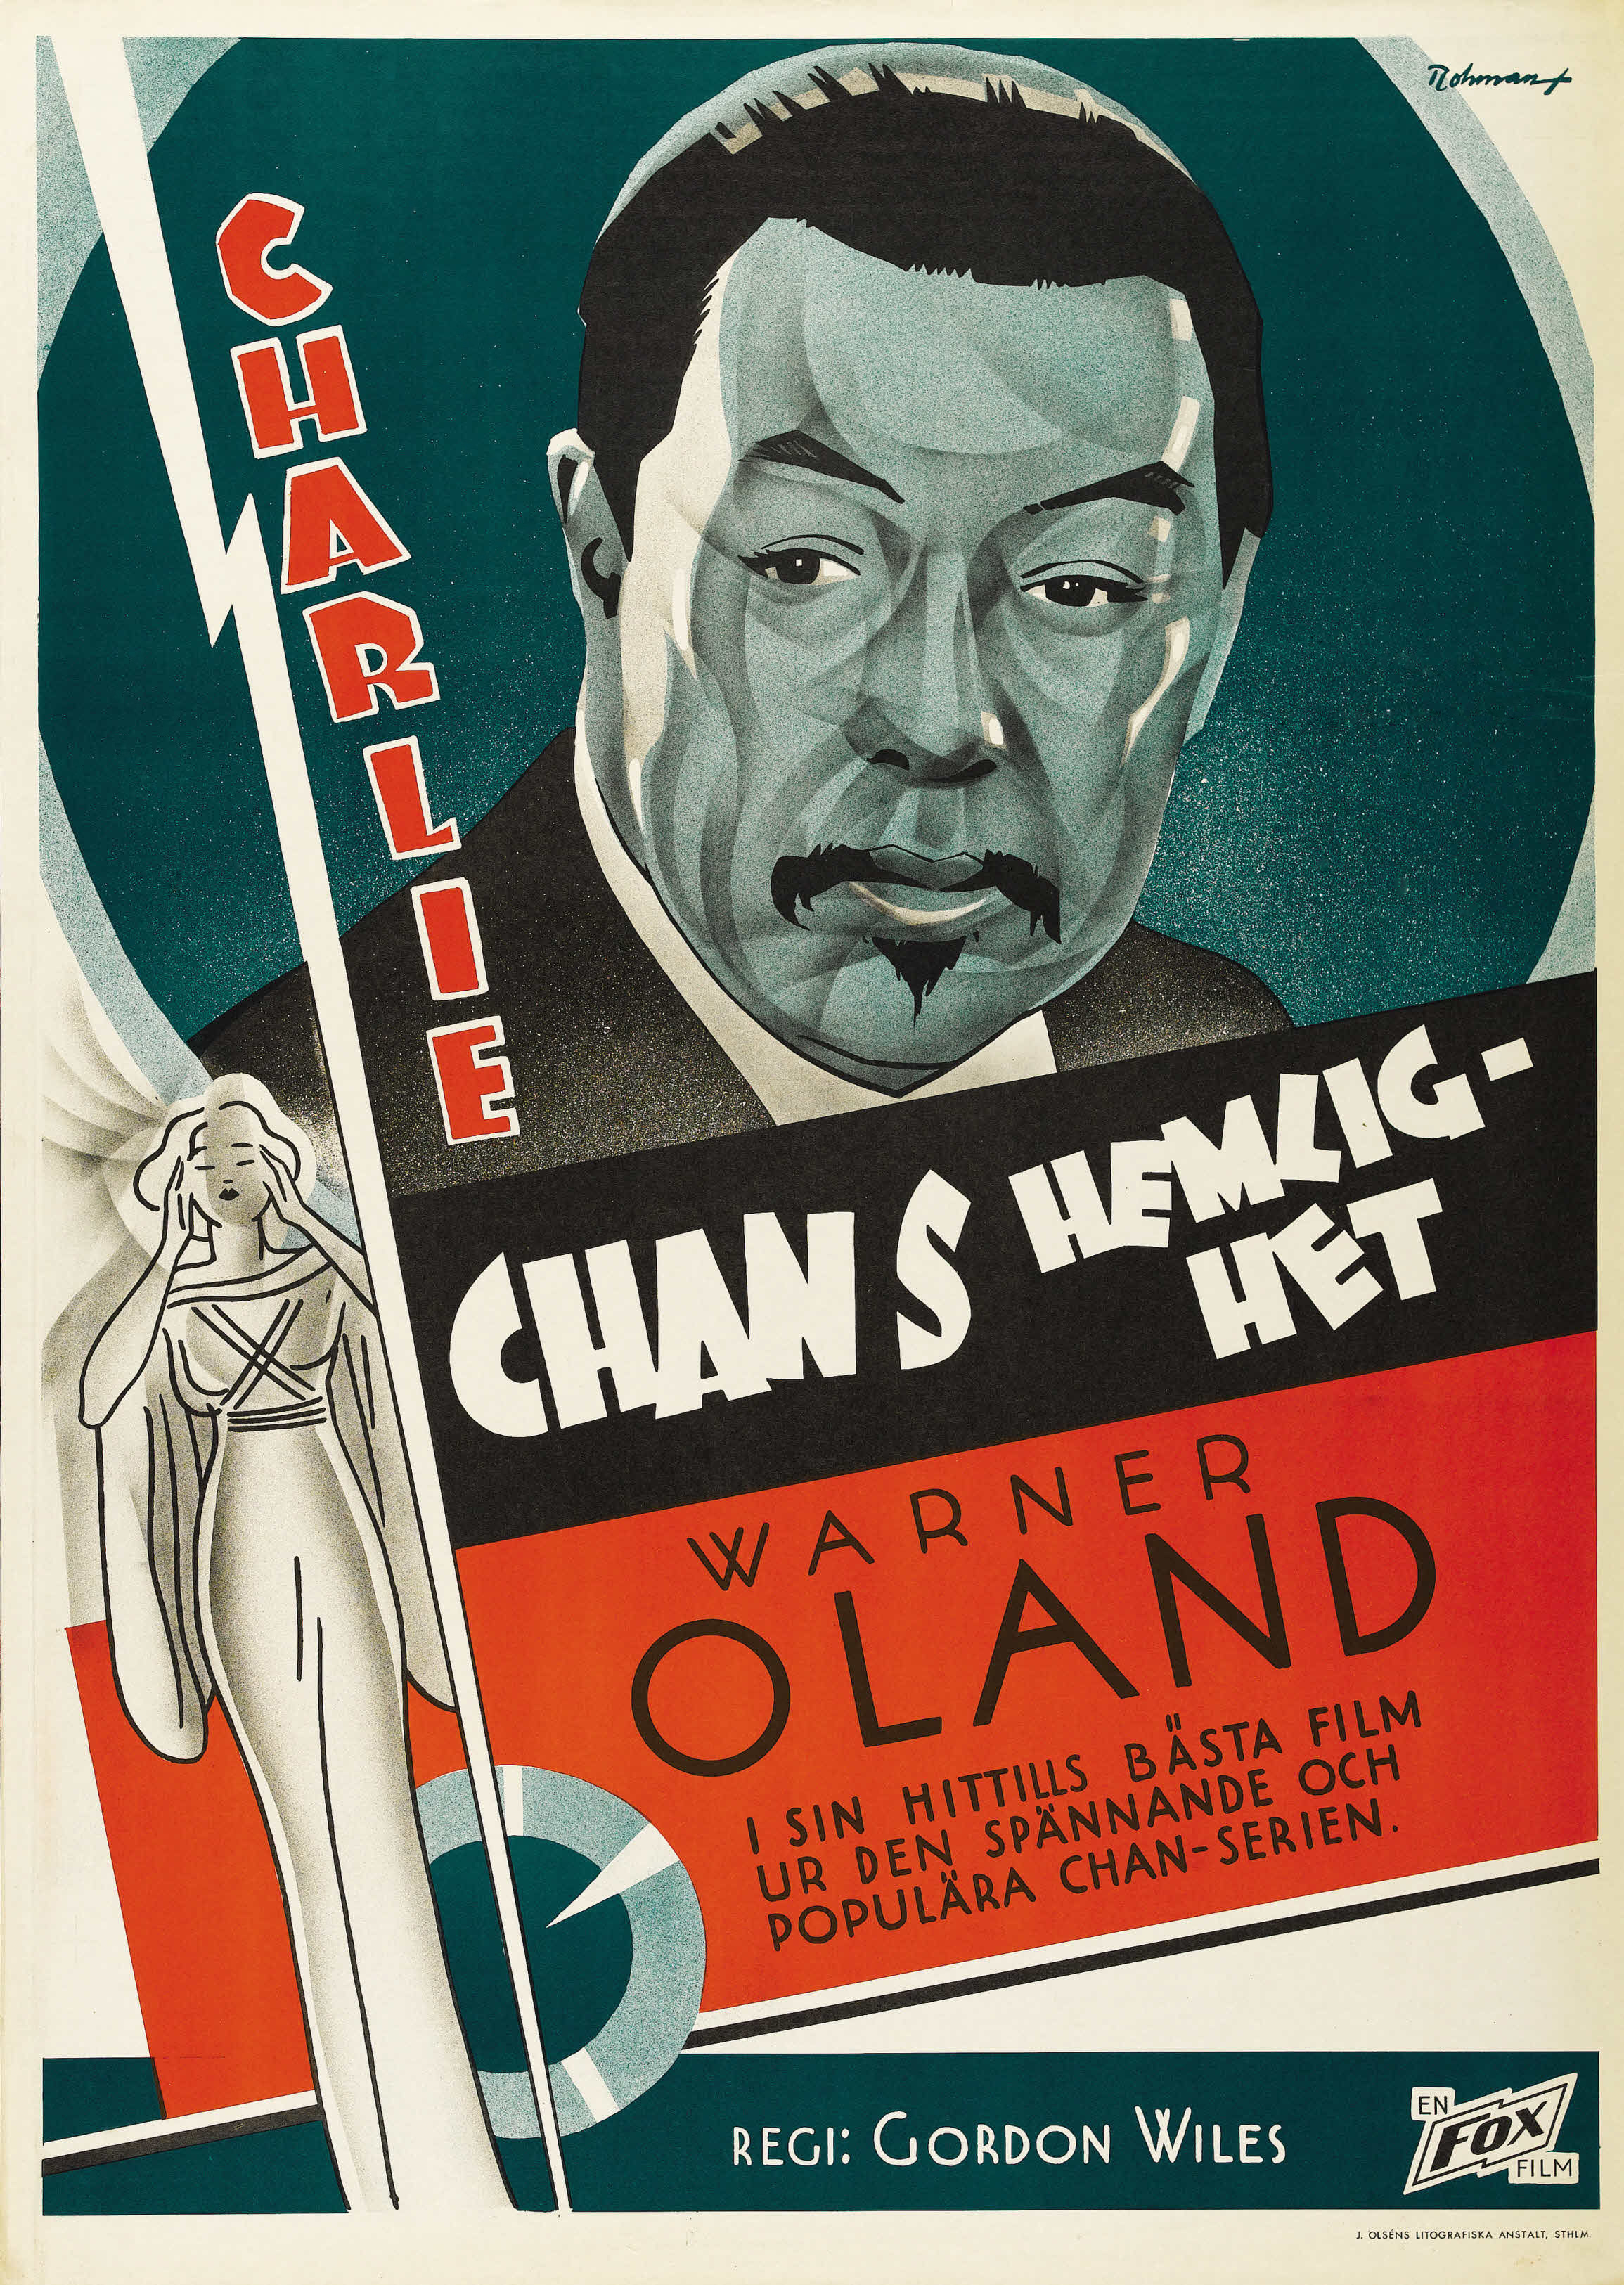 Charlie Chan S Secret